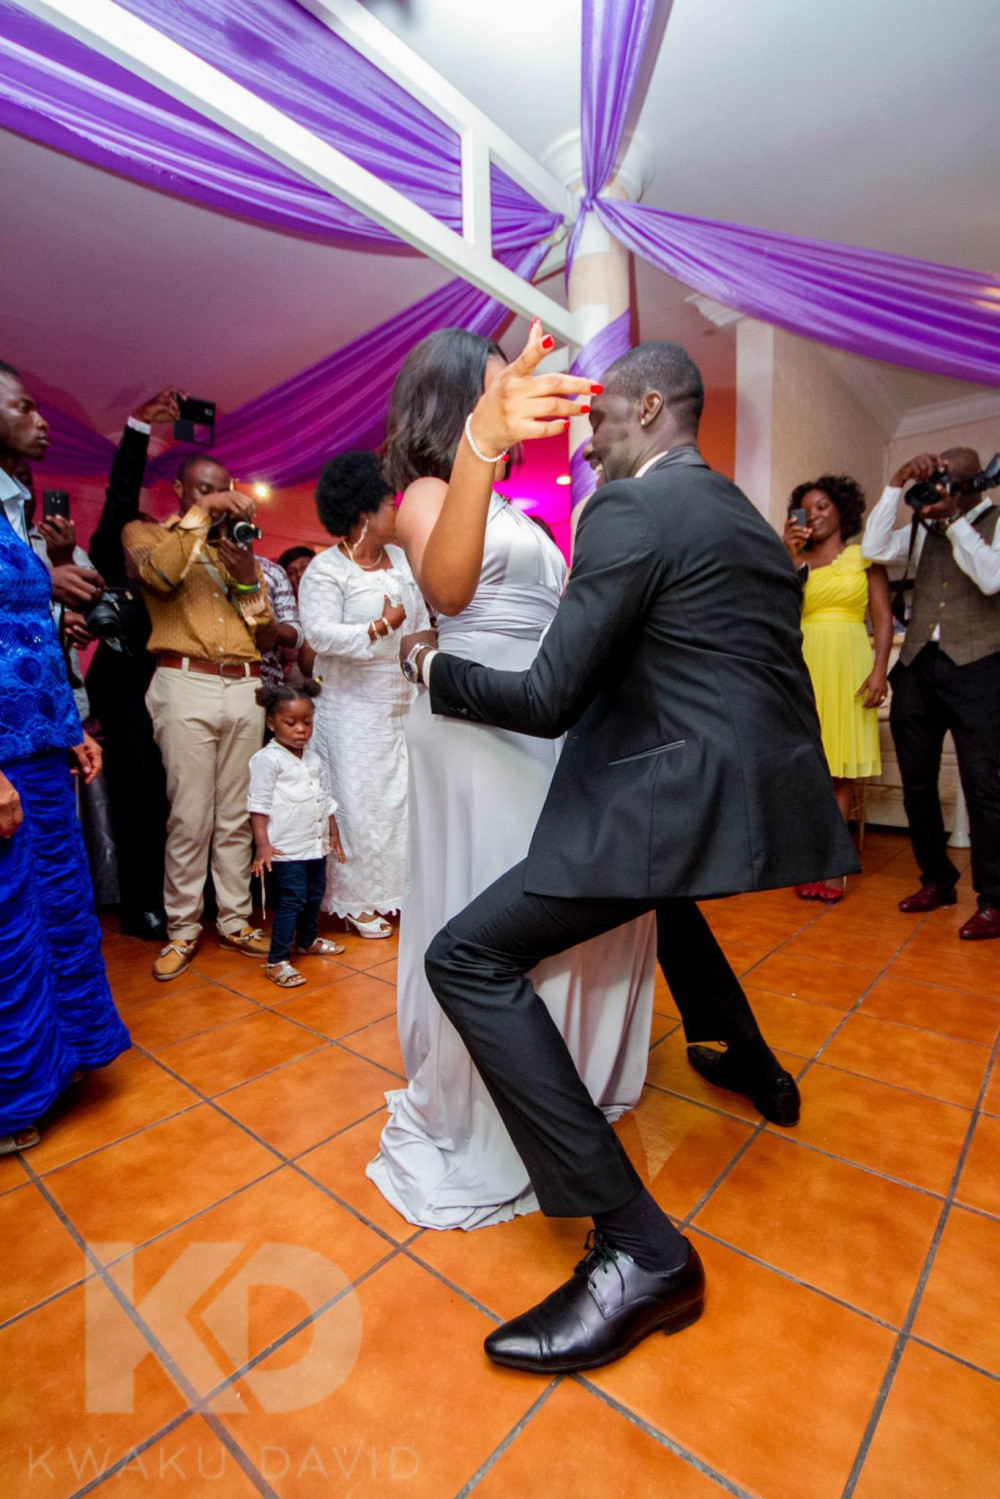 Damilola Adegbite & Chris Attoh Valentine's Day Wedding 2015 in Accra, Ghana | Kwaku David Photography | BellaNaija 014